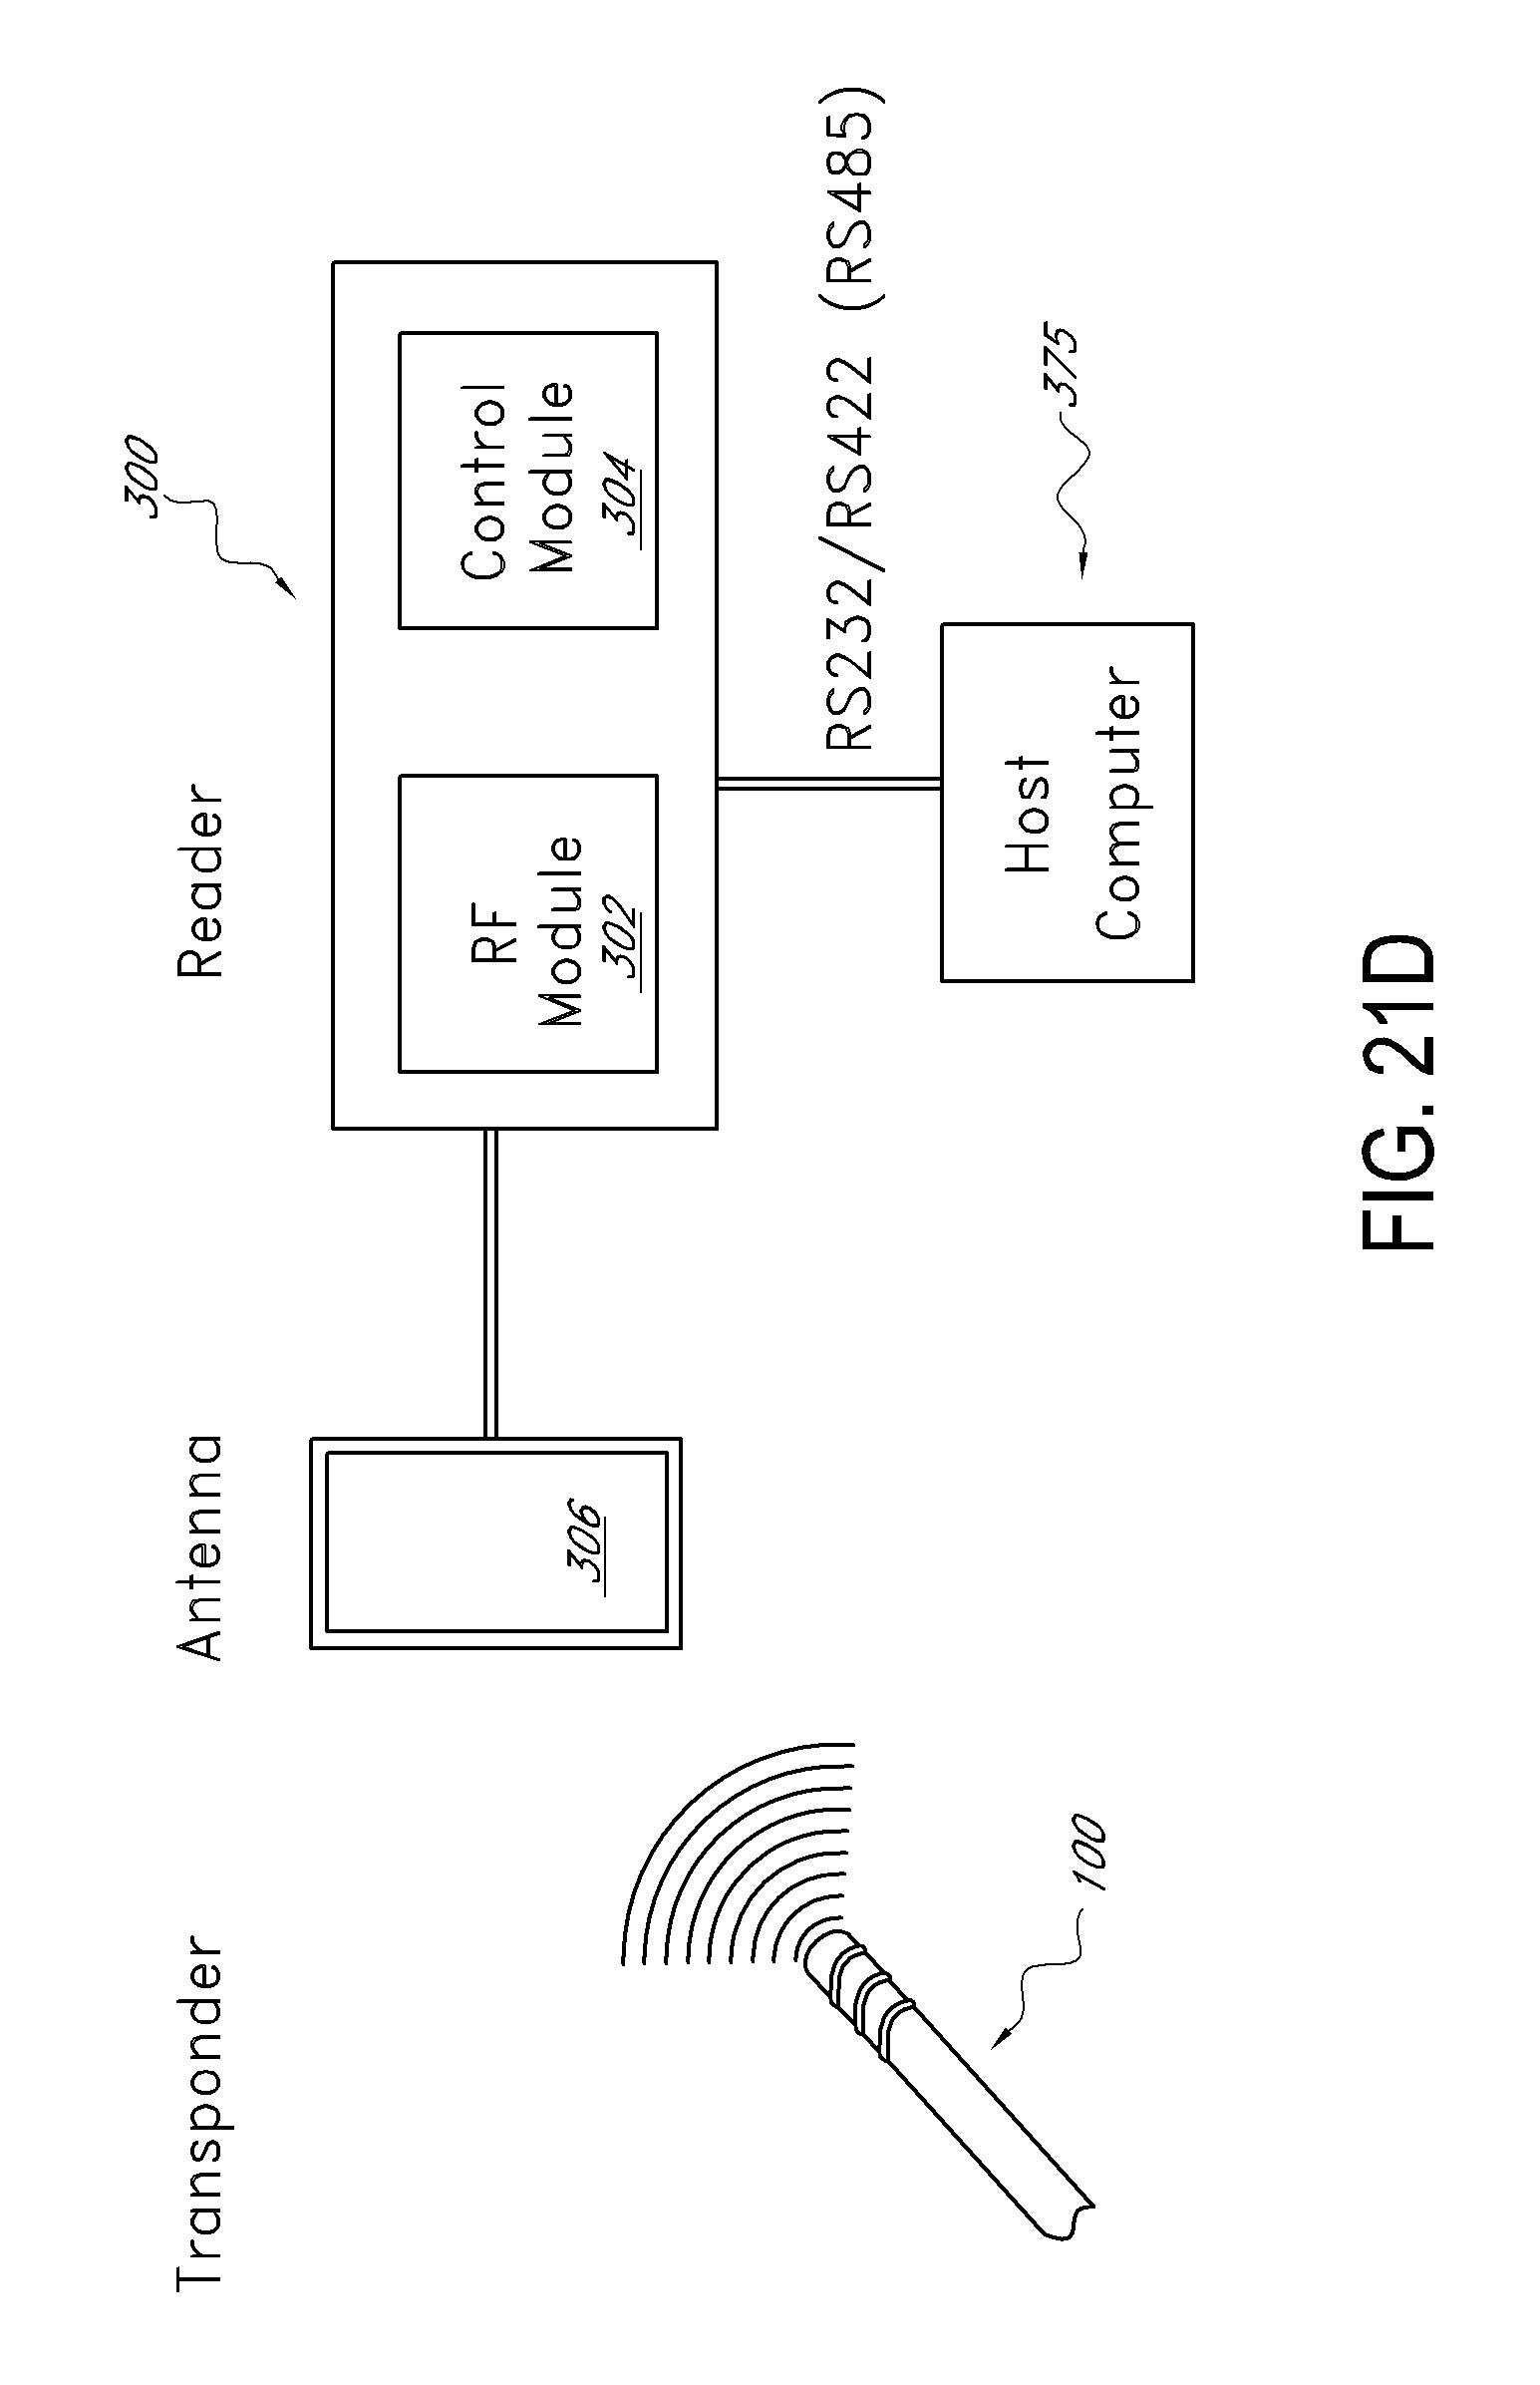 Patent US 9,039,533 B2